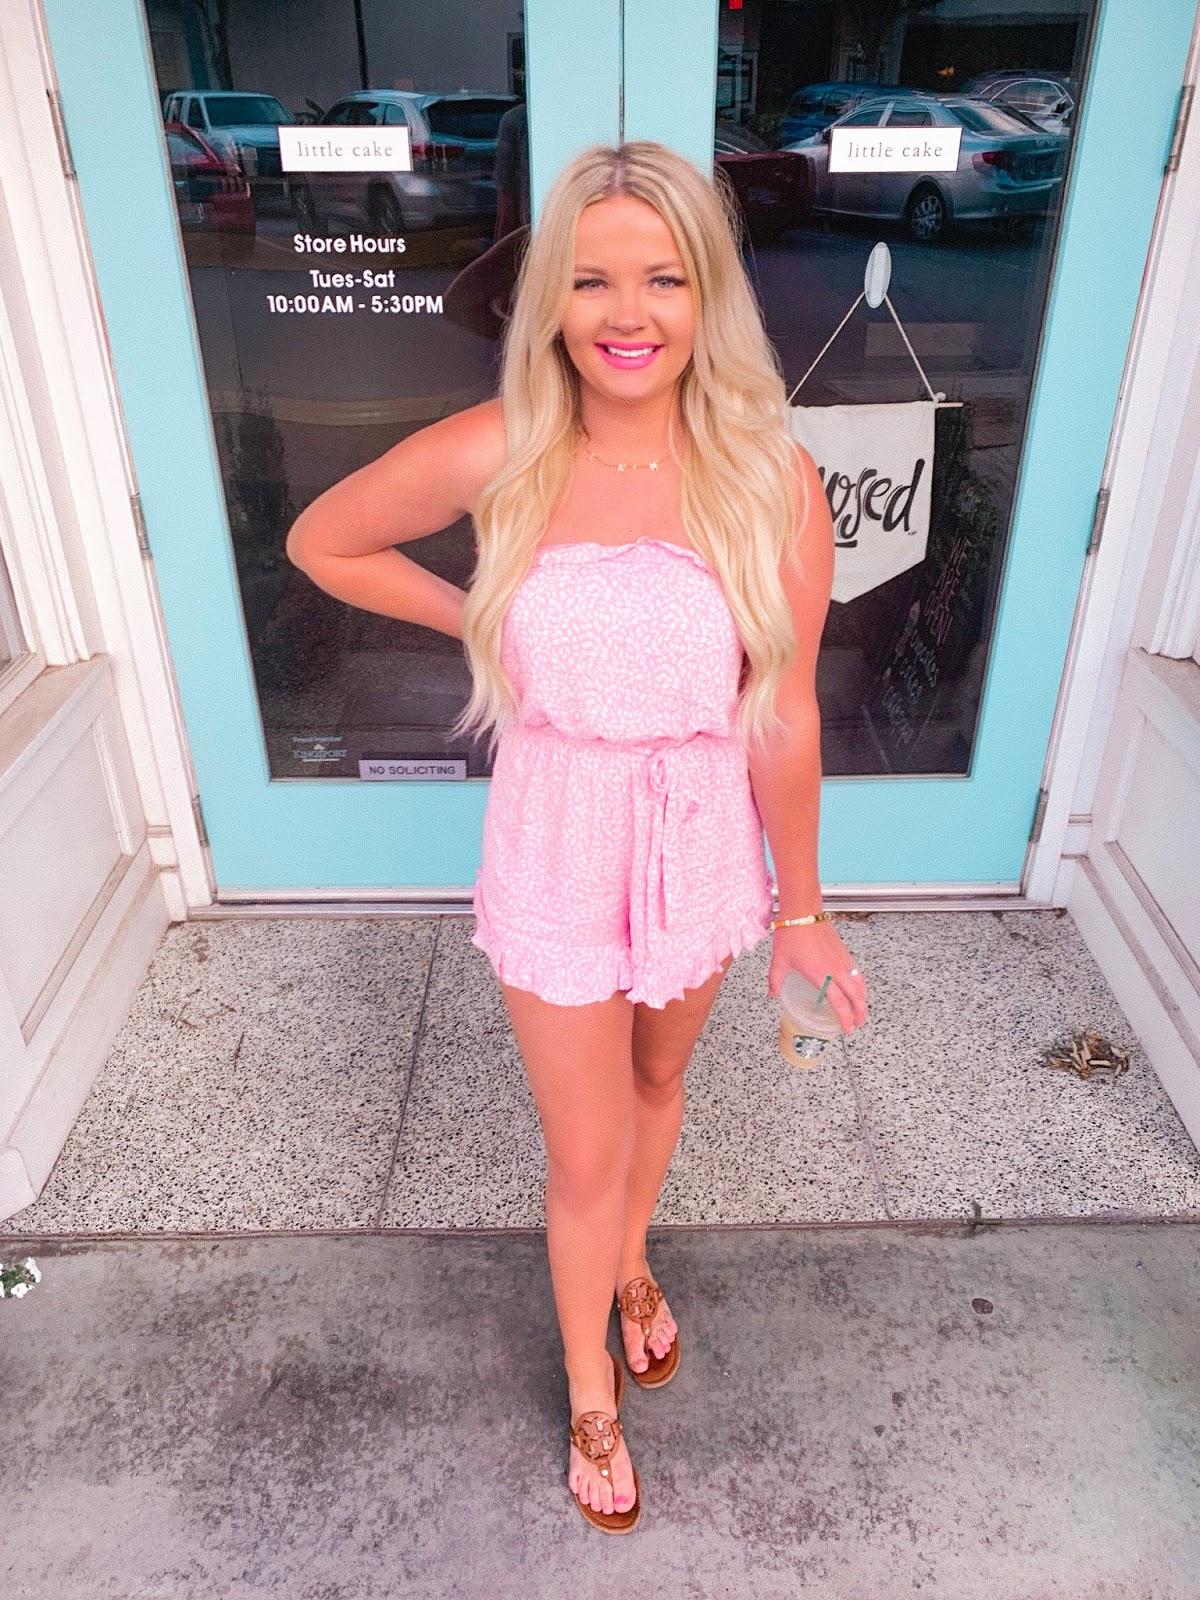 vici dolls laffy taffy pink polka dot ruffle romper